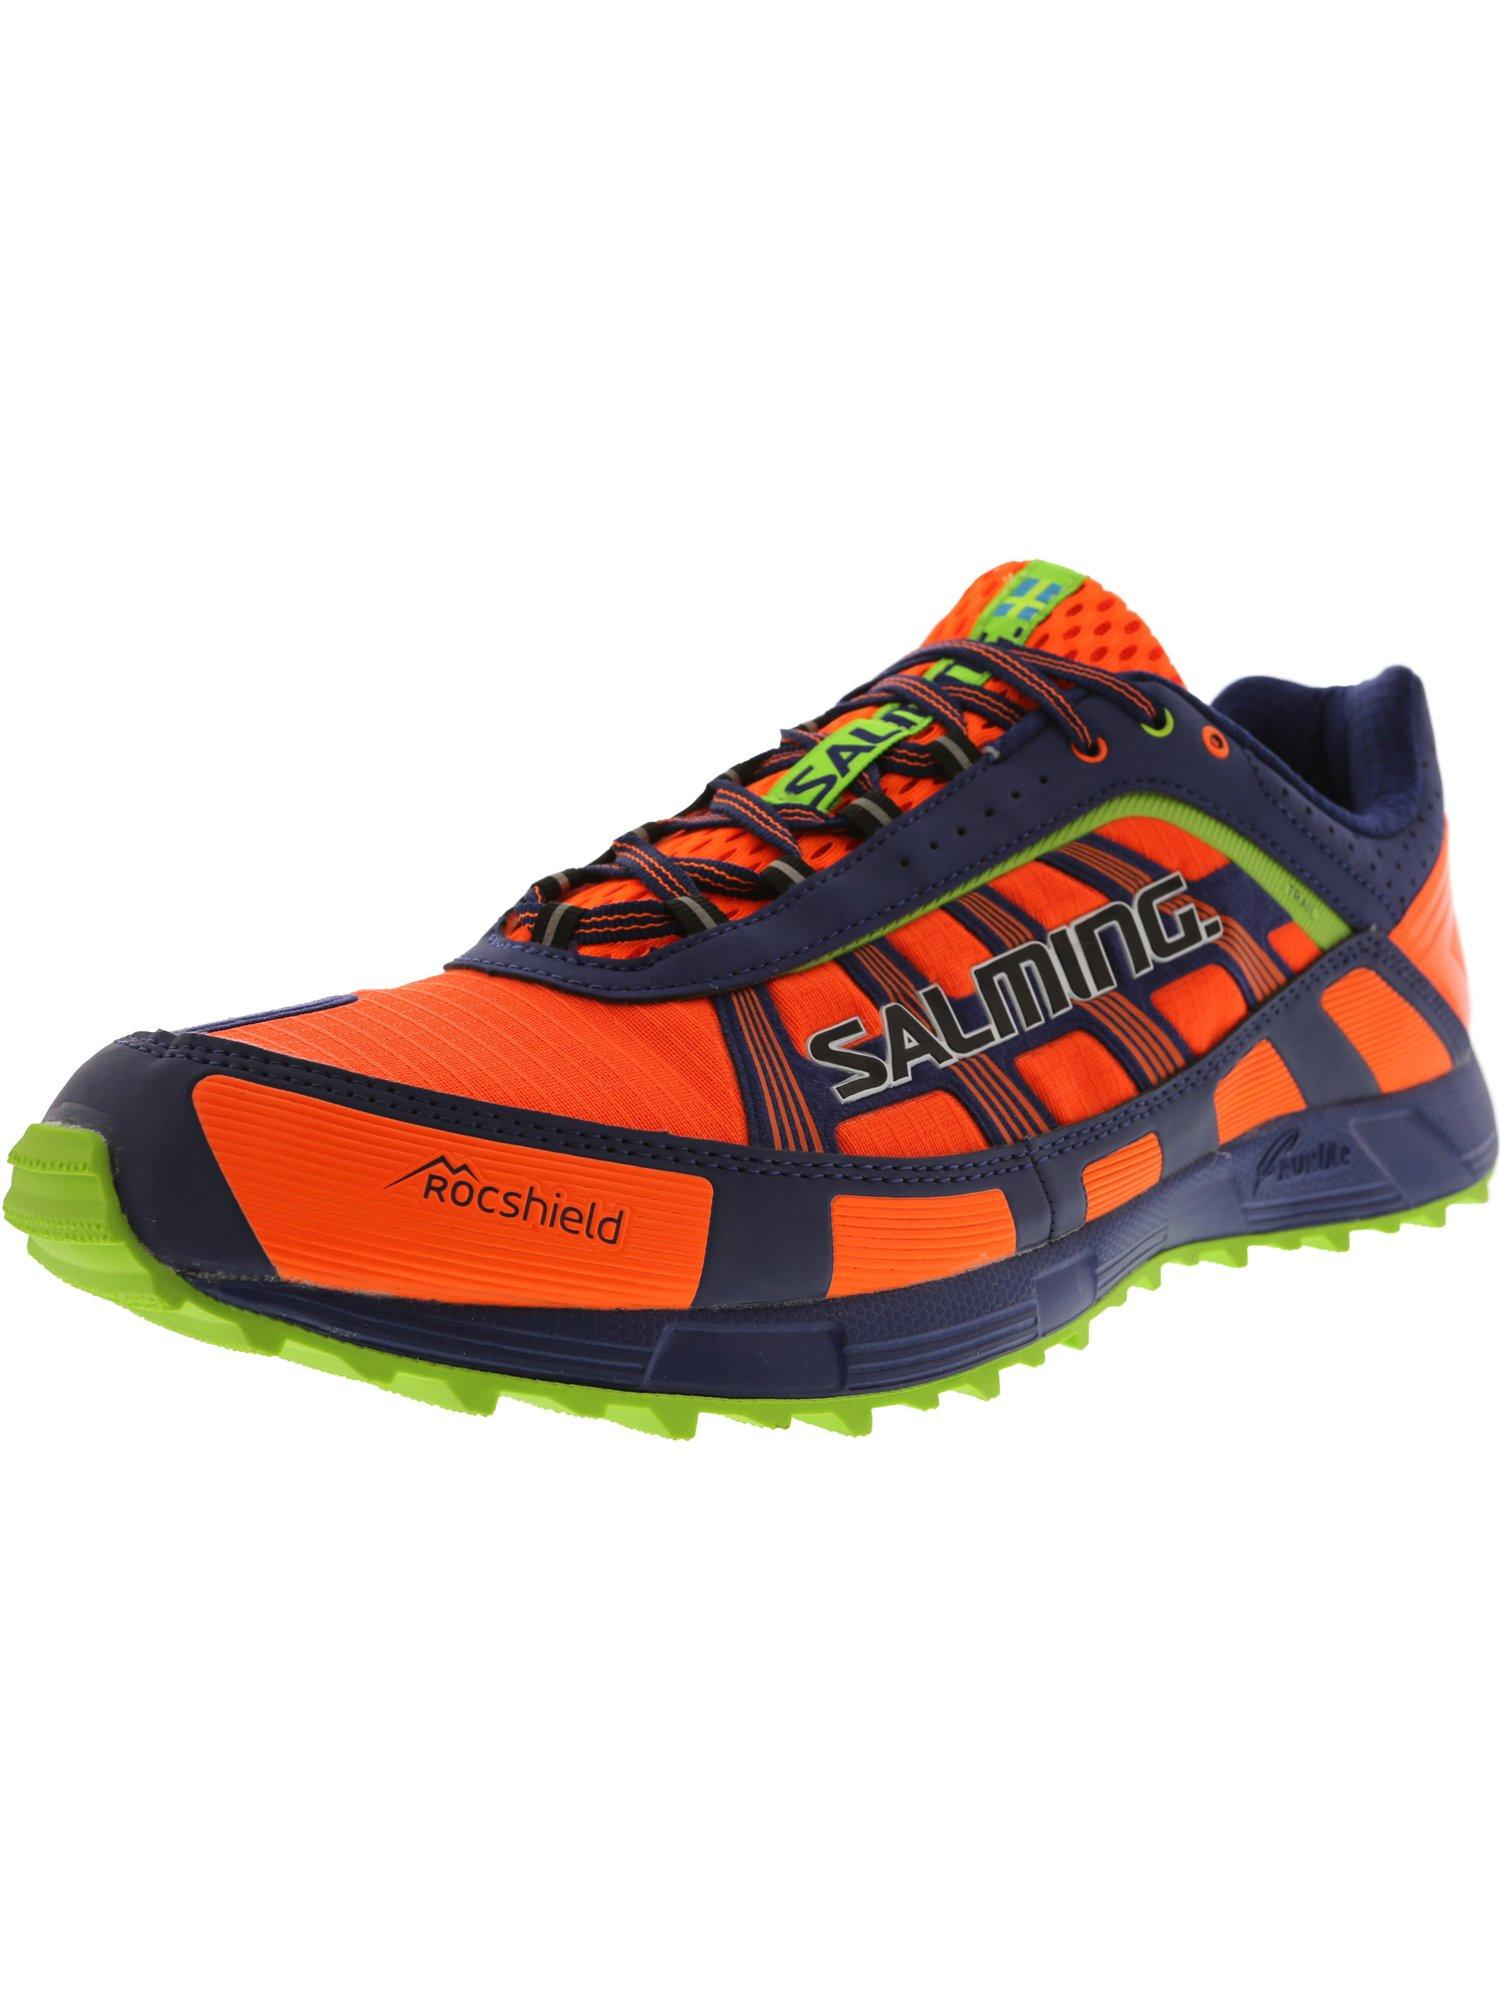 8b468a3e9336 Salming Men s Trail T3 Shocking Orange   Deep Blue Ankle-High Runner - 12.5M